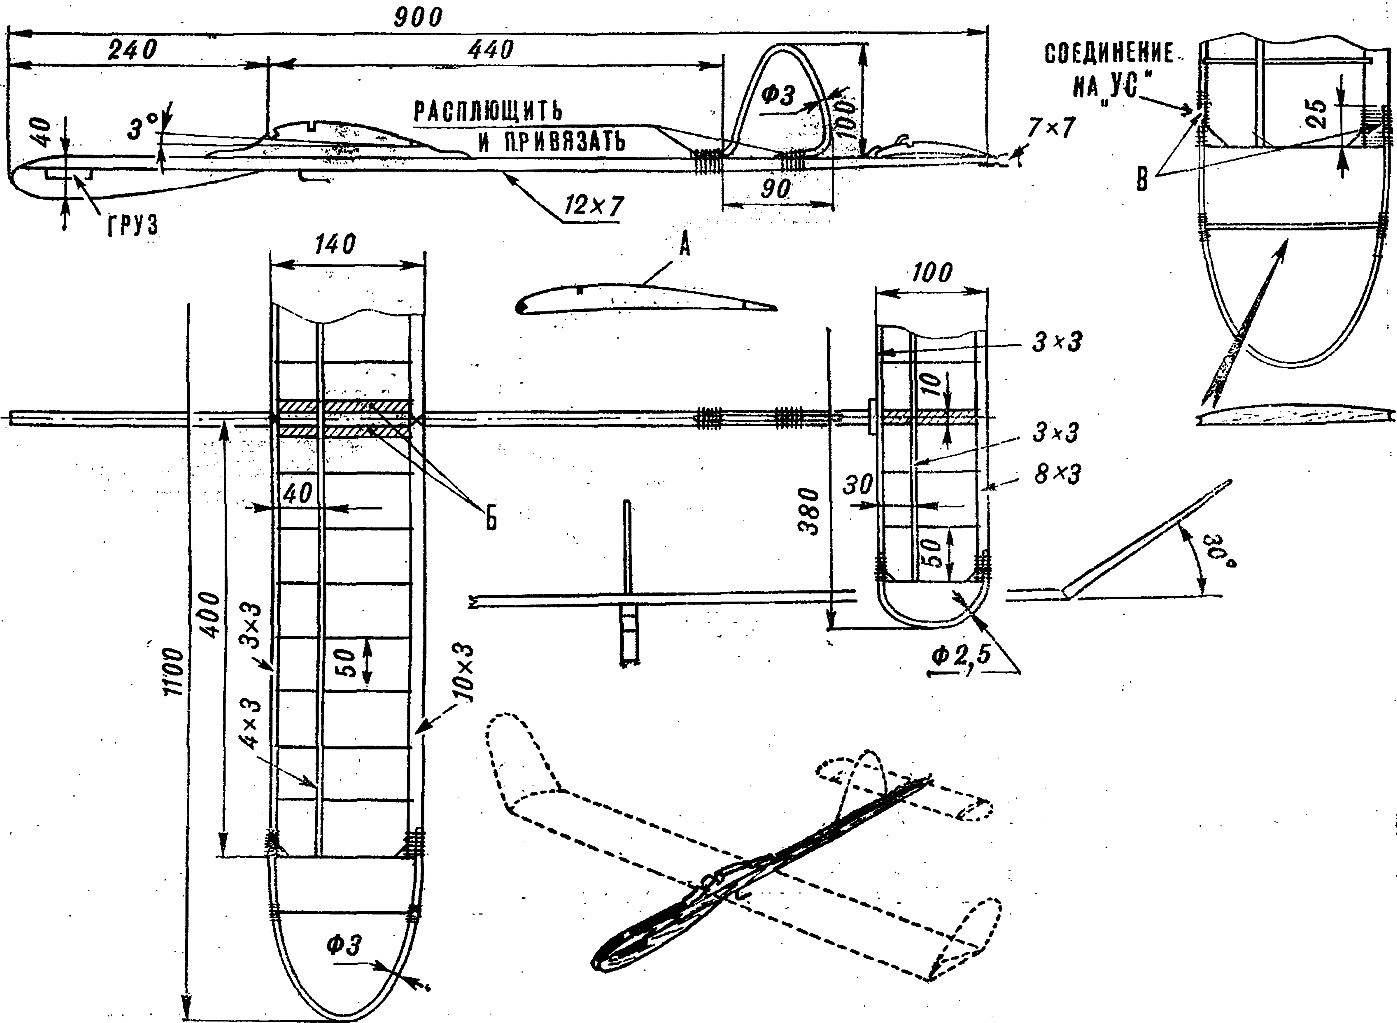 training glider model